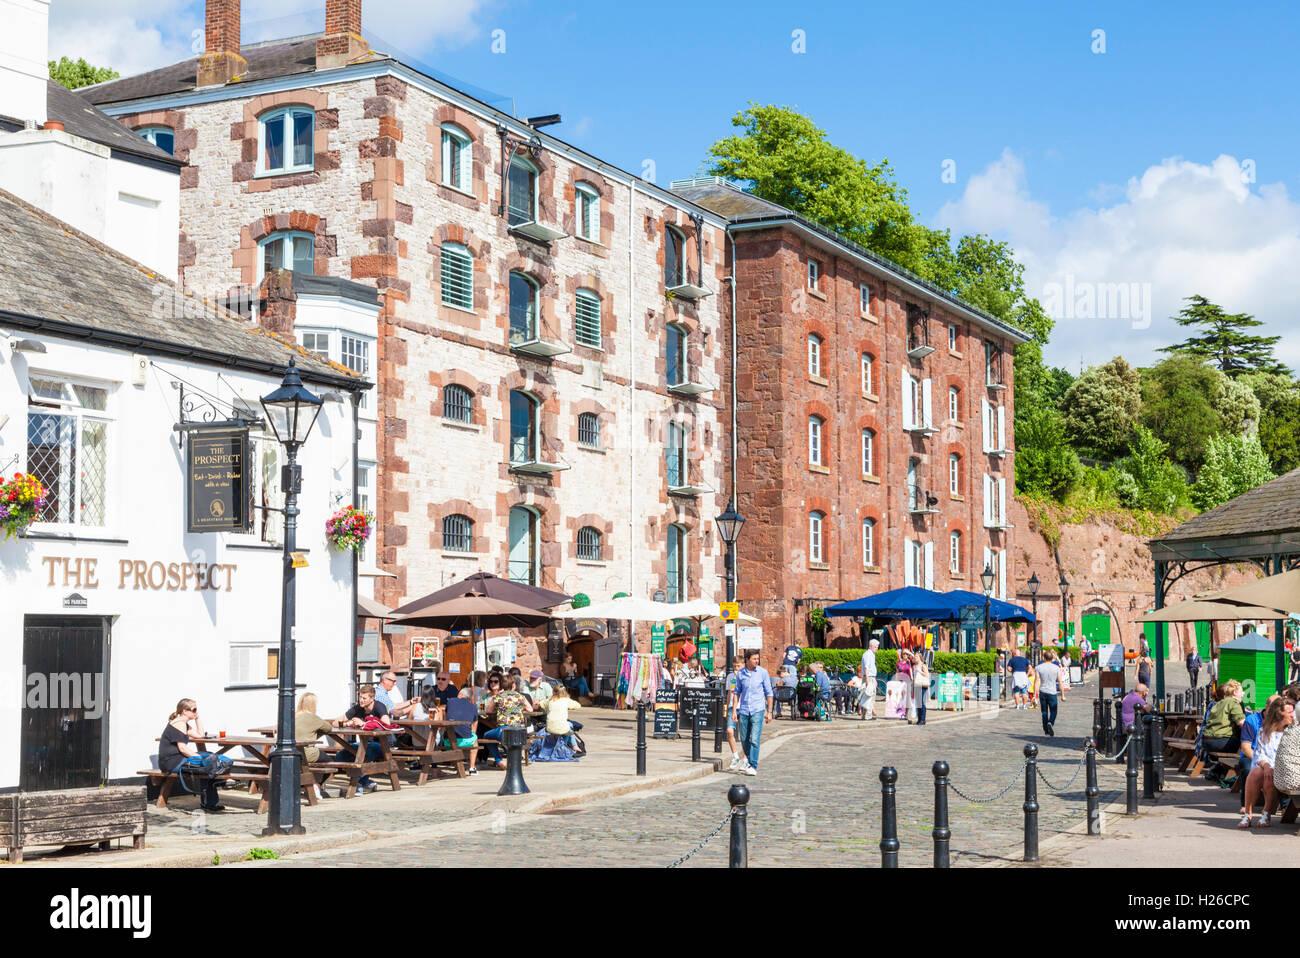 I negozi e i ristoranti a Exeter Quay Exeter Devon England Regno Unito GB EU Europe Immagini Stock